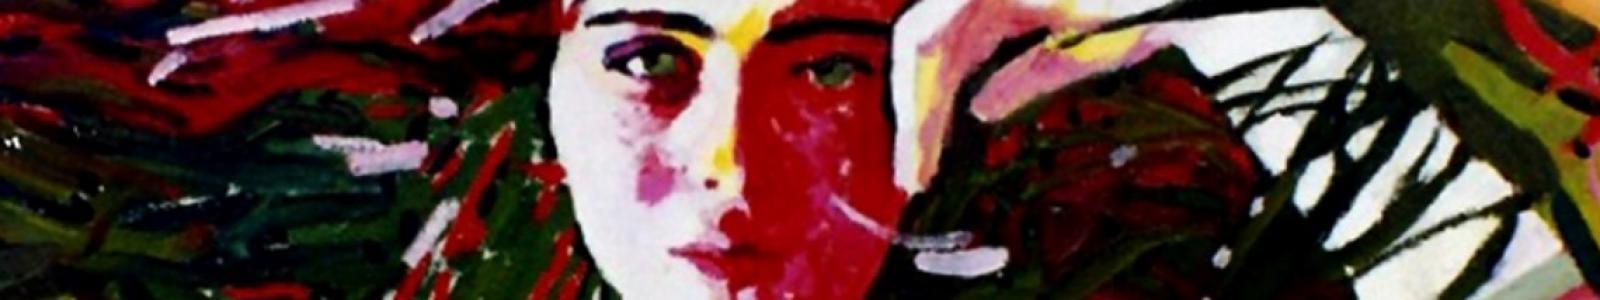 Gallery Painter Yulia Bird